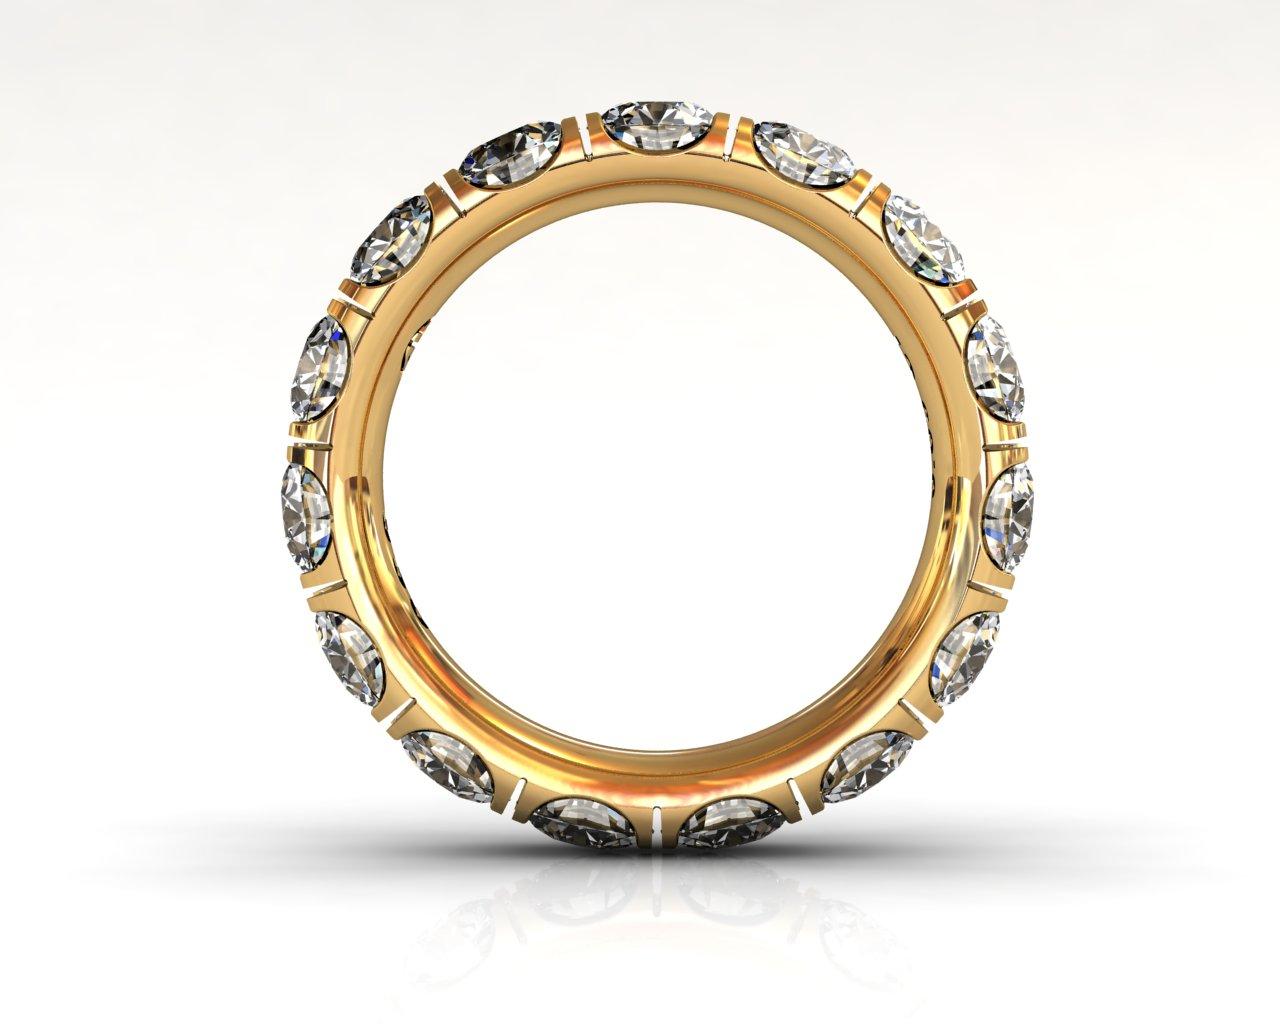 Wedding Bands Ladies Diamonds Craponia Setting 15 Stone 3.85 TCW Diamonds 4.60g 18kt Yellow Gold